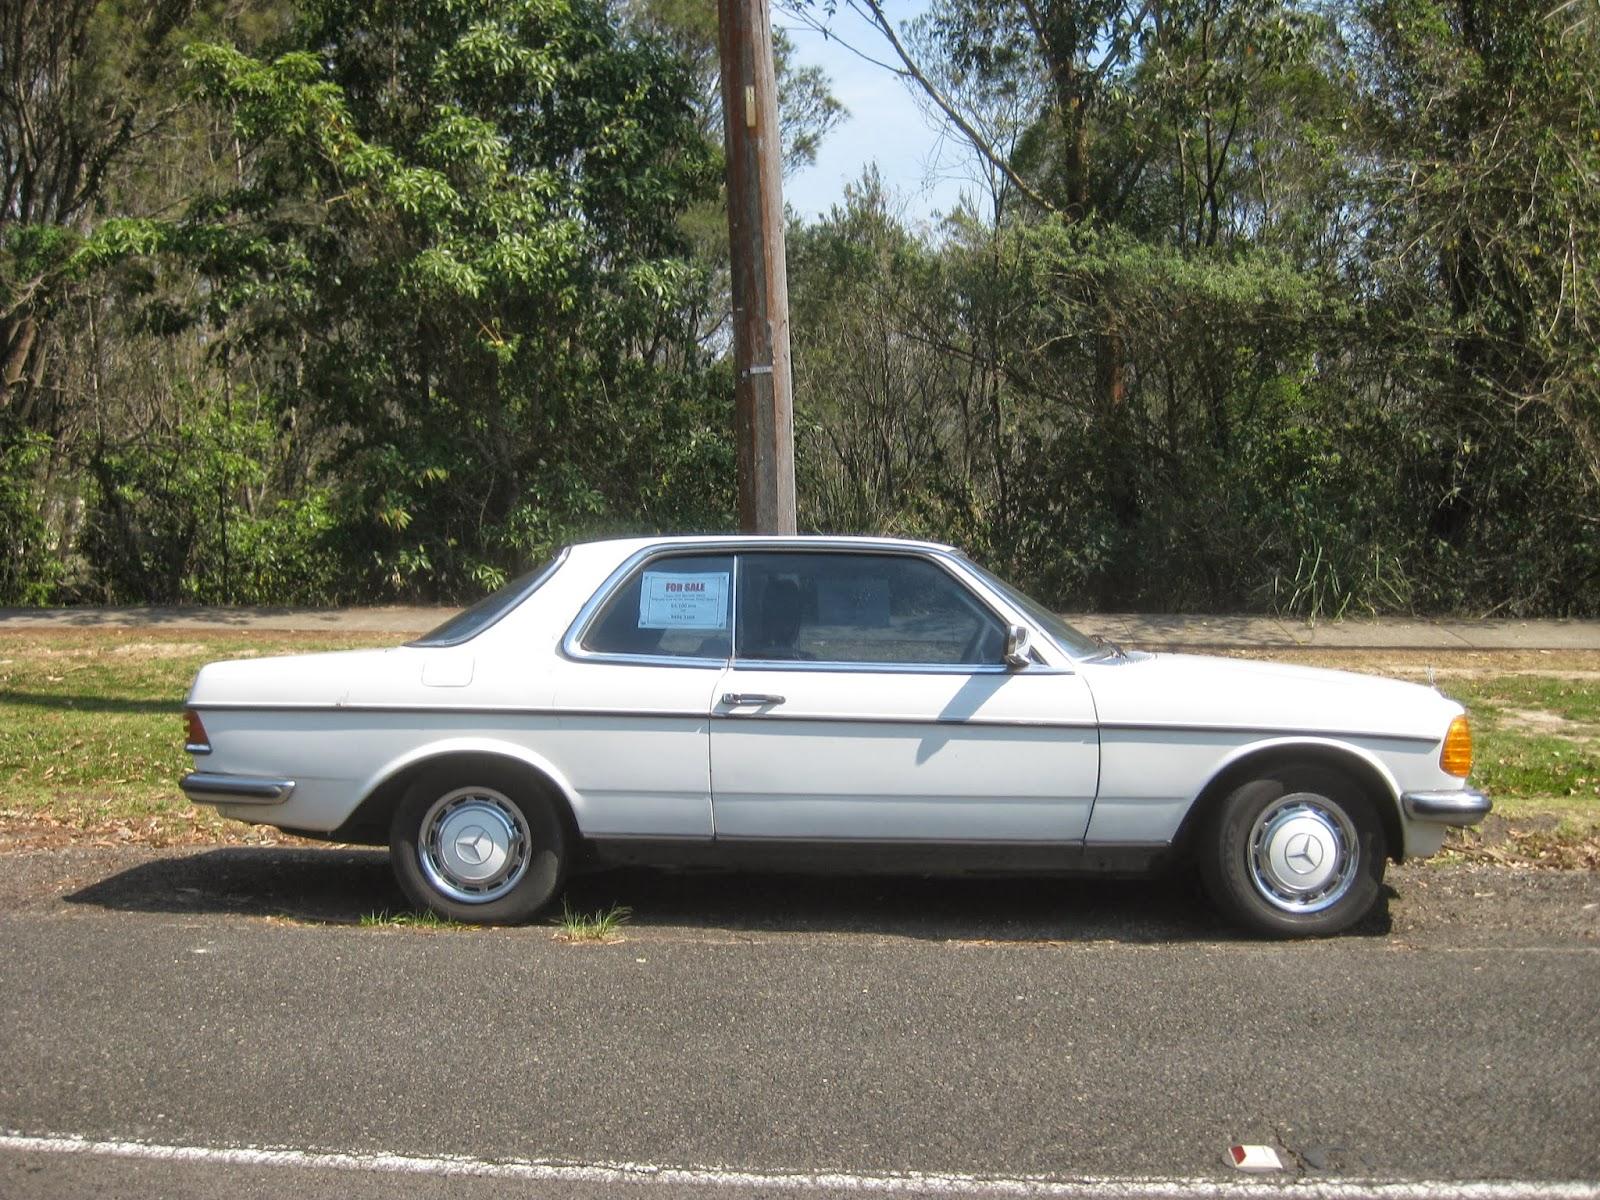 Aussie old parked cars 1978 mercedes benz w123 280 ce for Mercedes benz w123